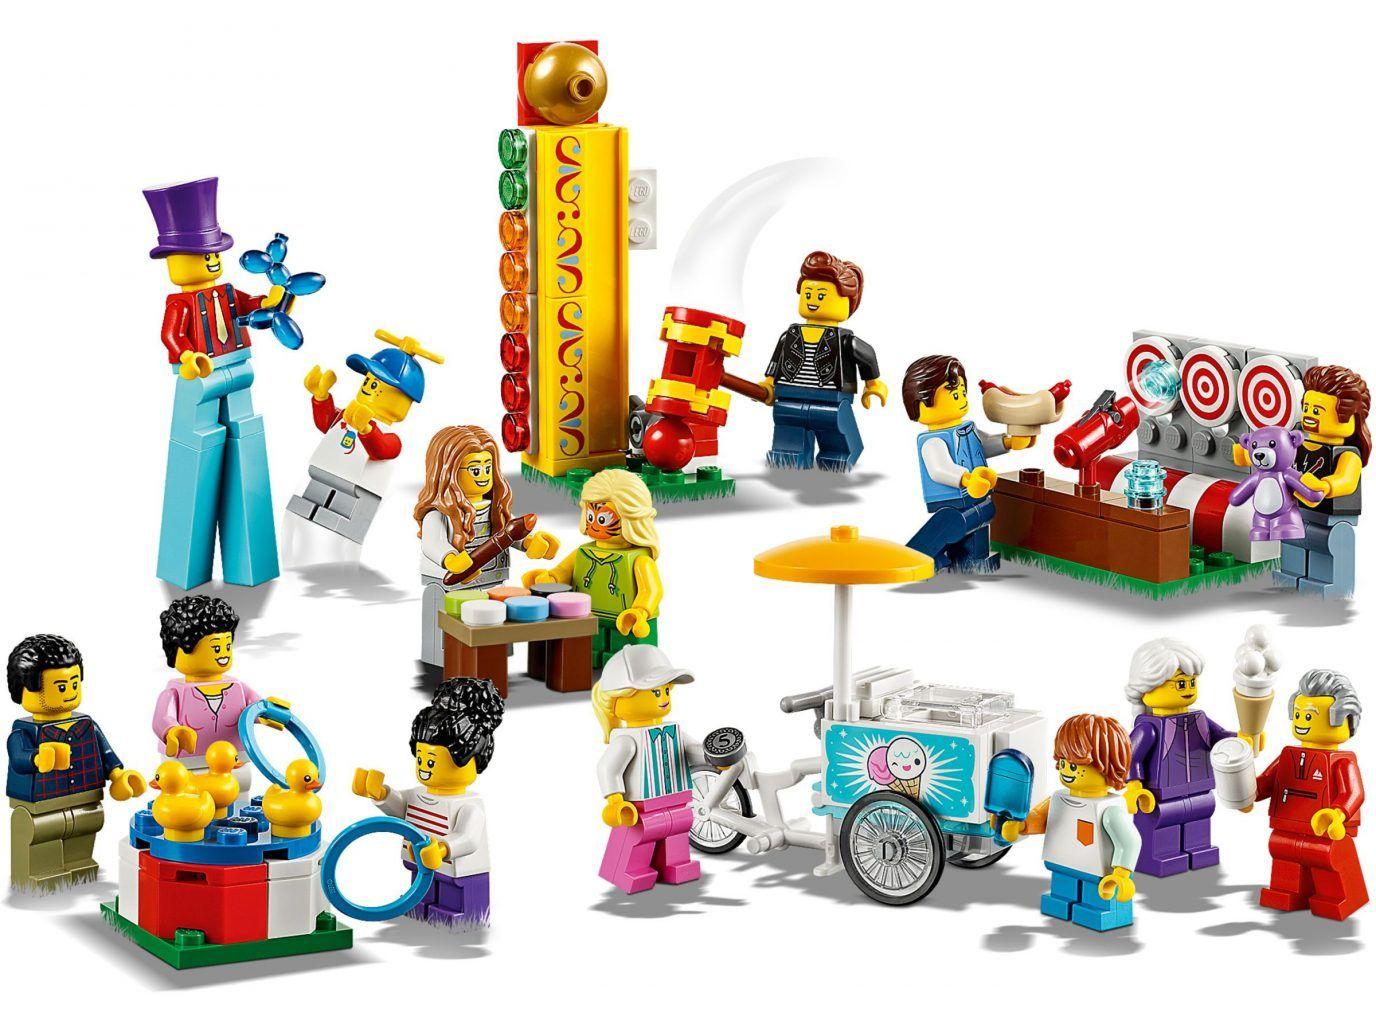 More LEGO City summer 2019 sets revealed including new